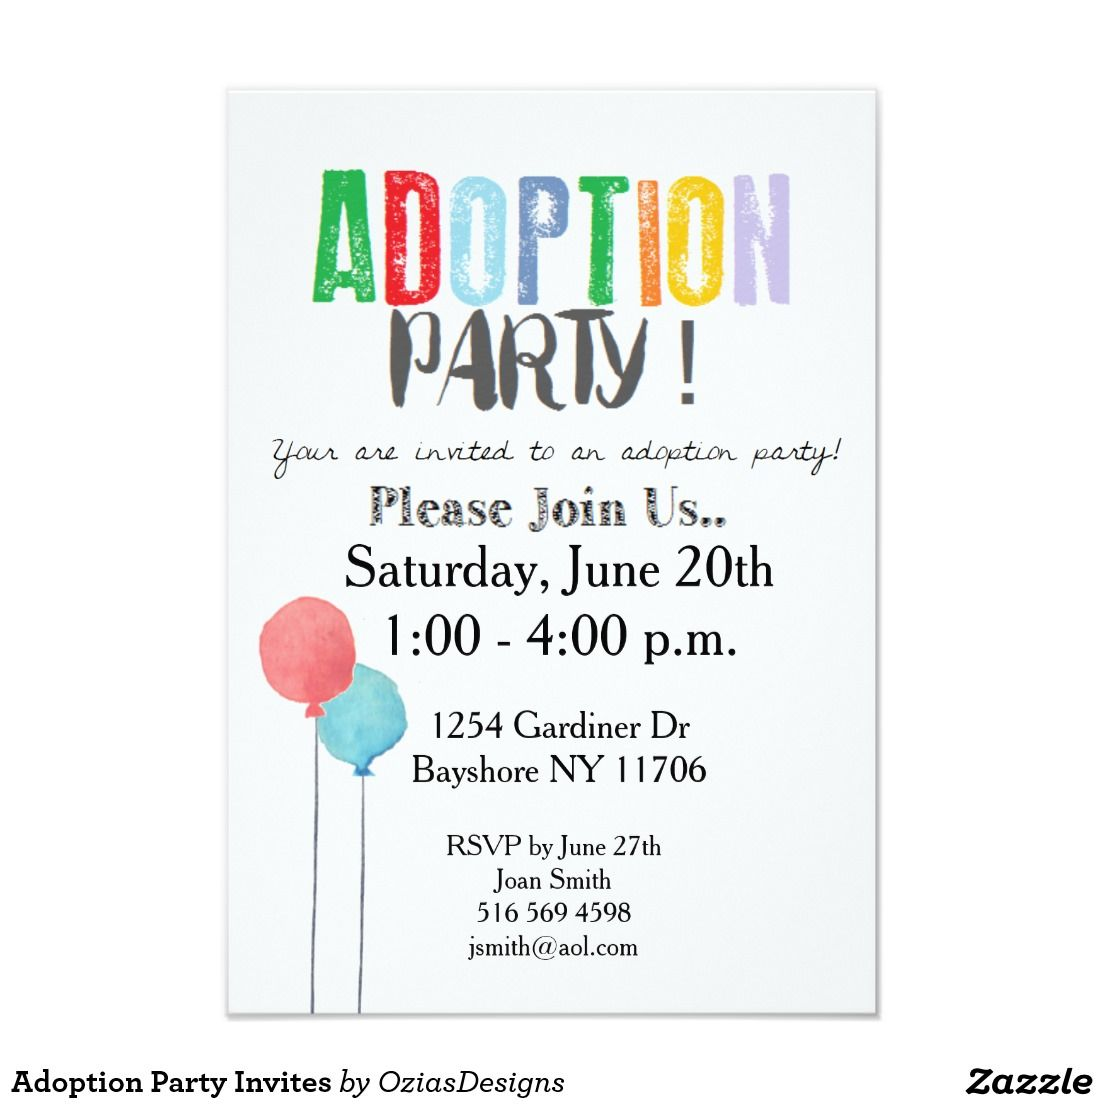 Adoption Party Invites Pinterest Adoption party Adoption and